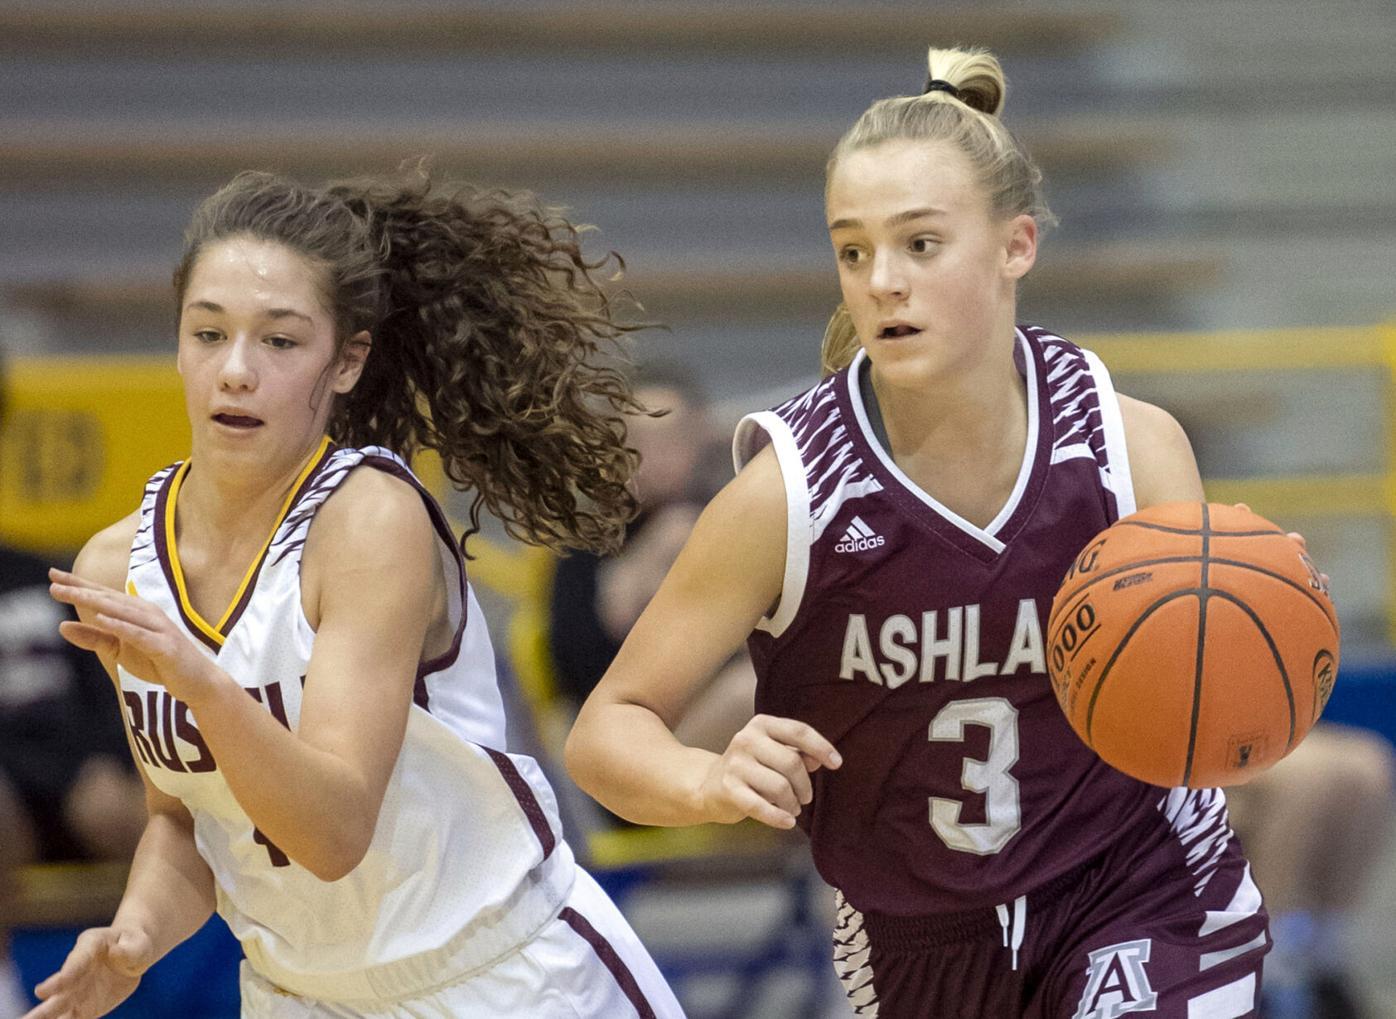 Ashland v Russell Girls